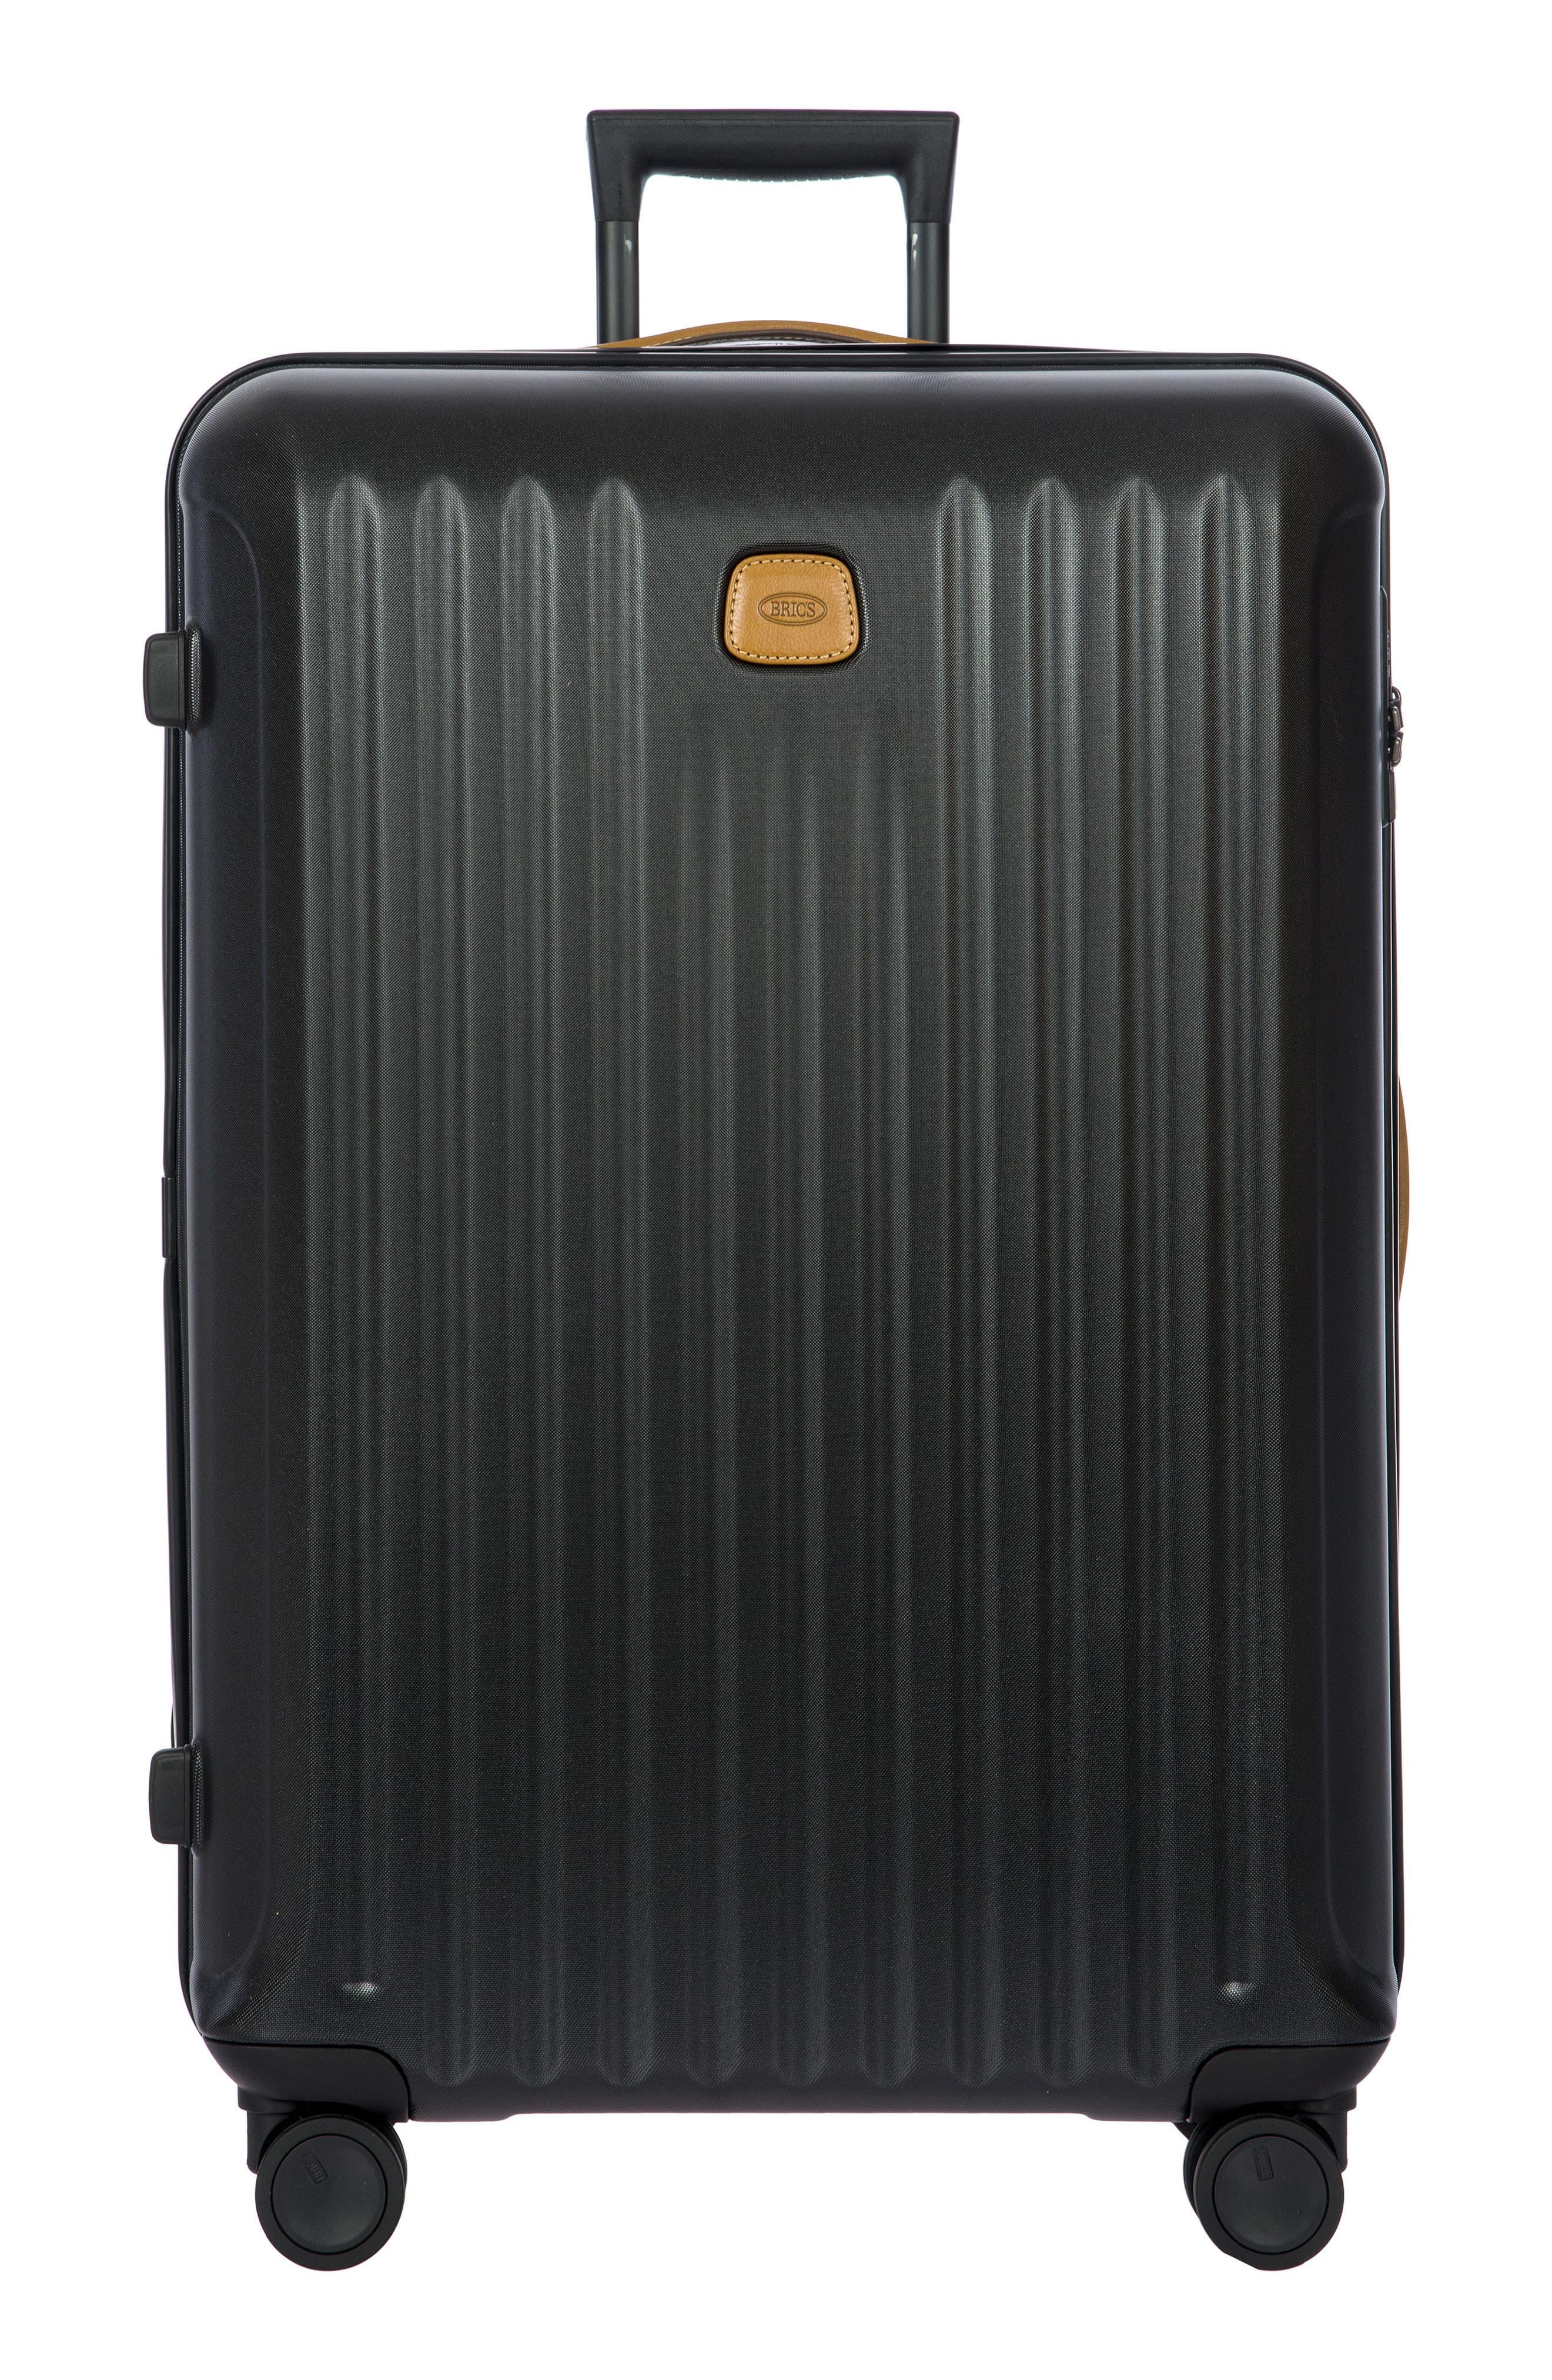 Capri 30-Inch Rolling Suitcase - Black in Matte Black